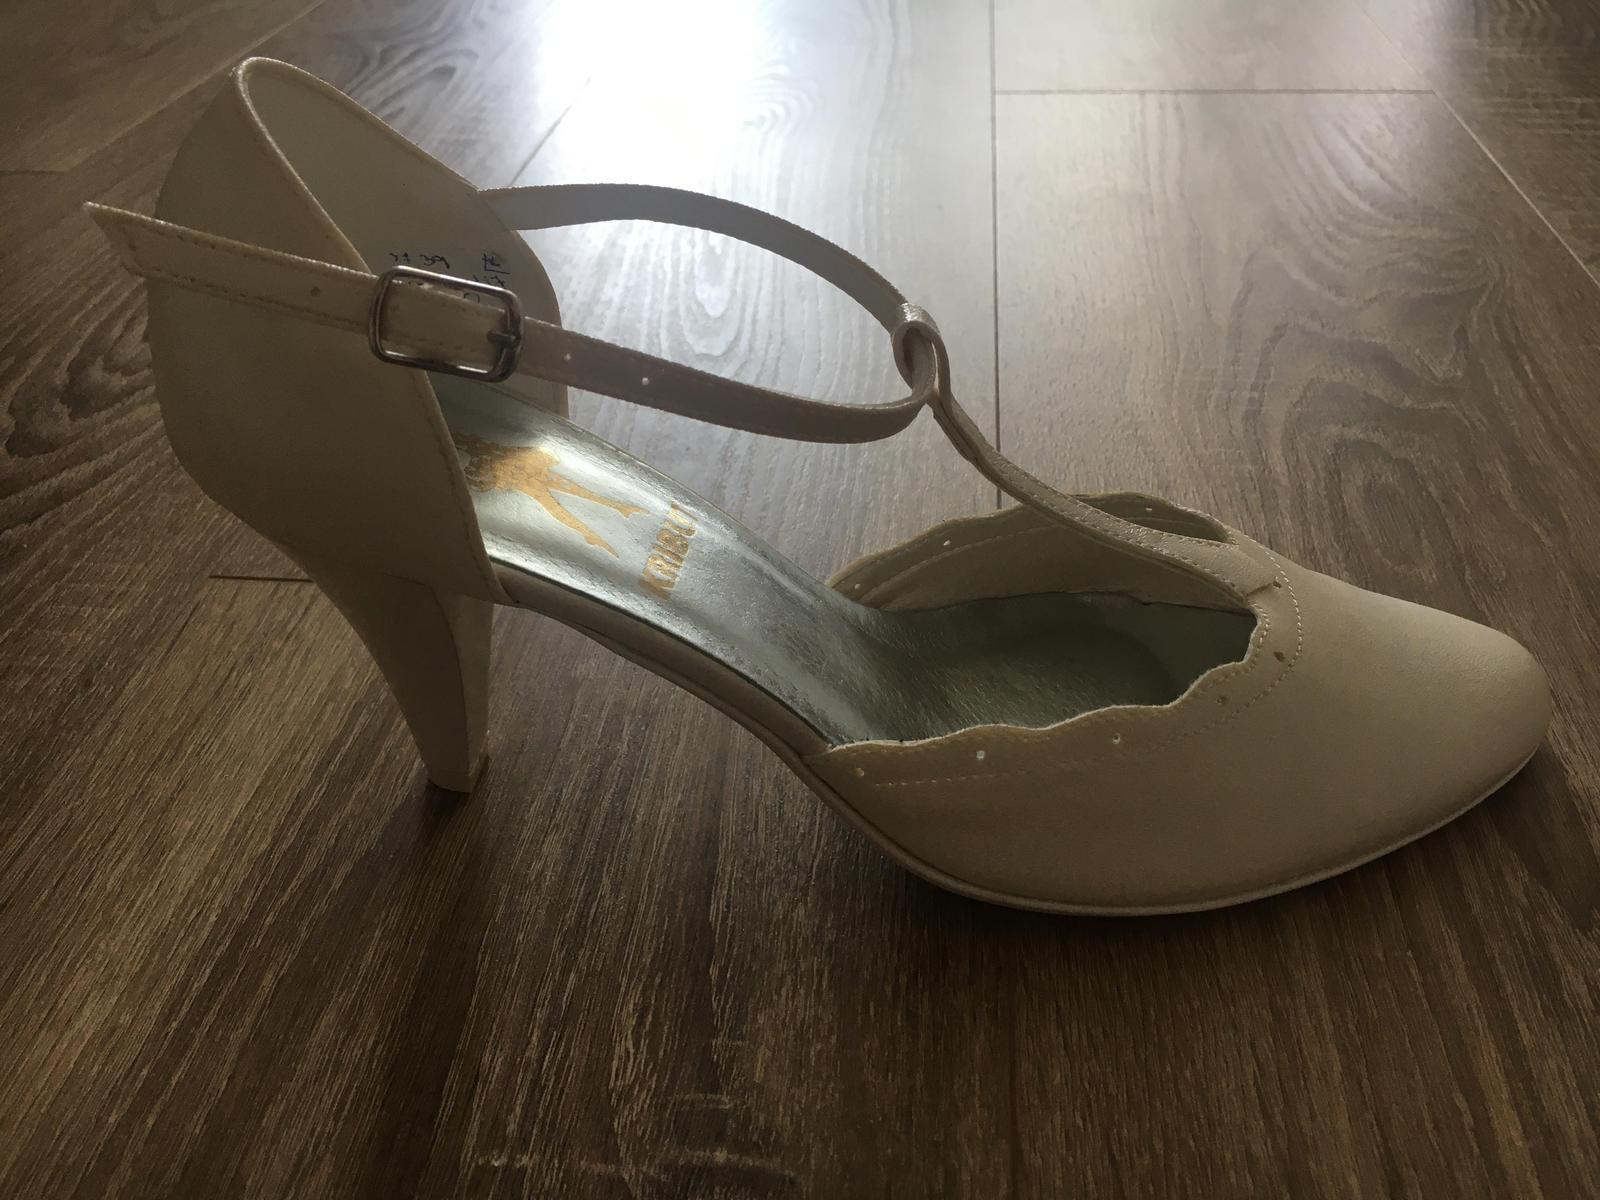 Svadobné topánky - nepoužívané - Obrázok č. 2